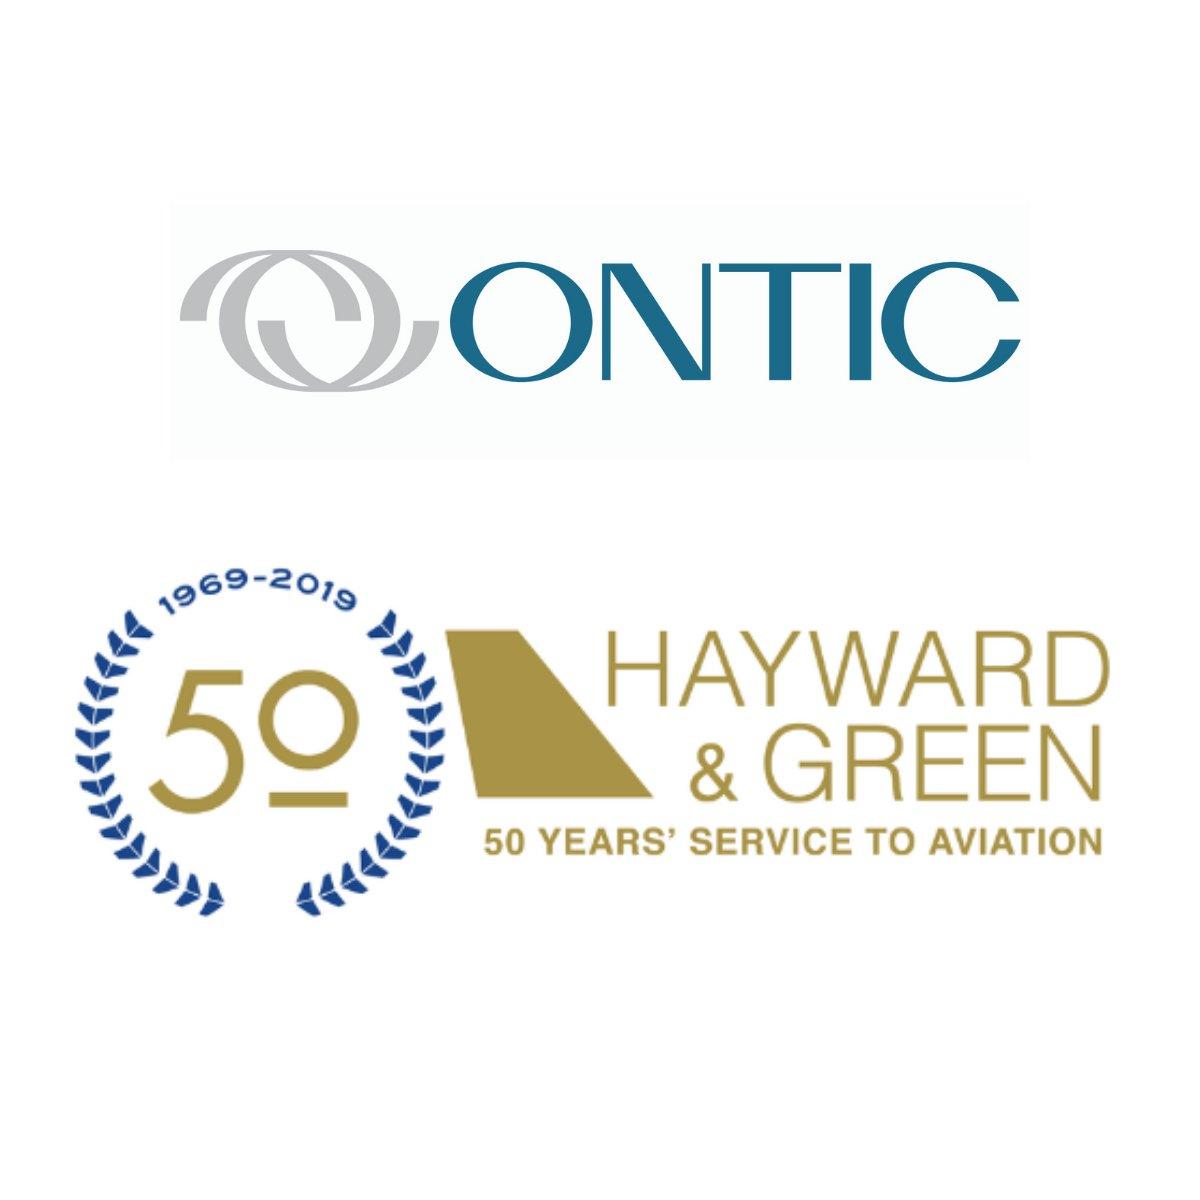 Hayward and Green Twitter